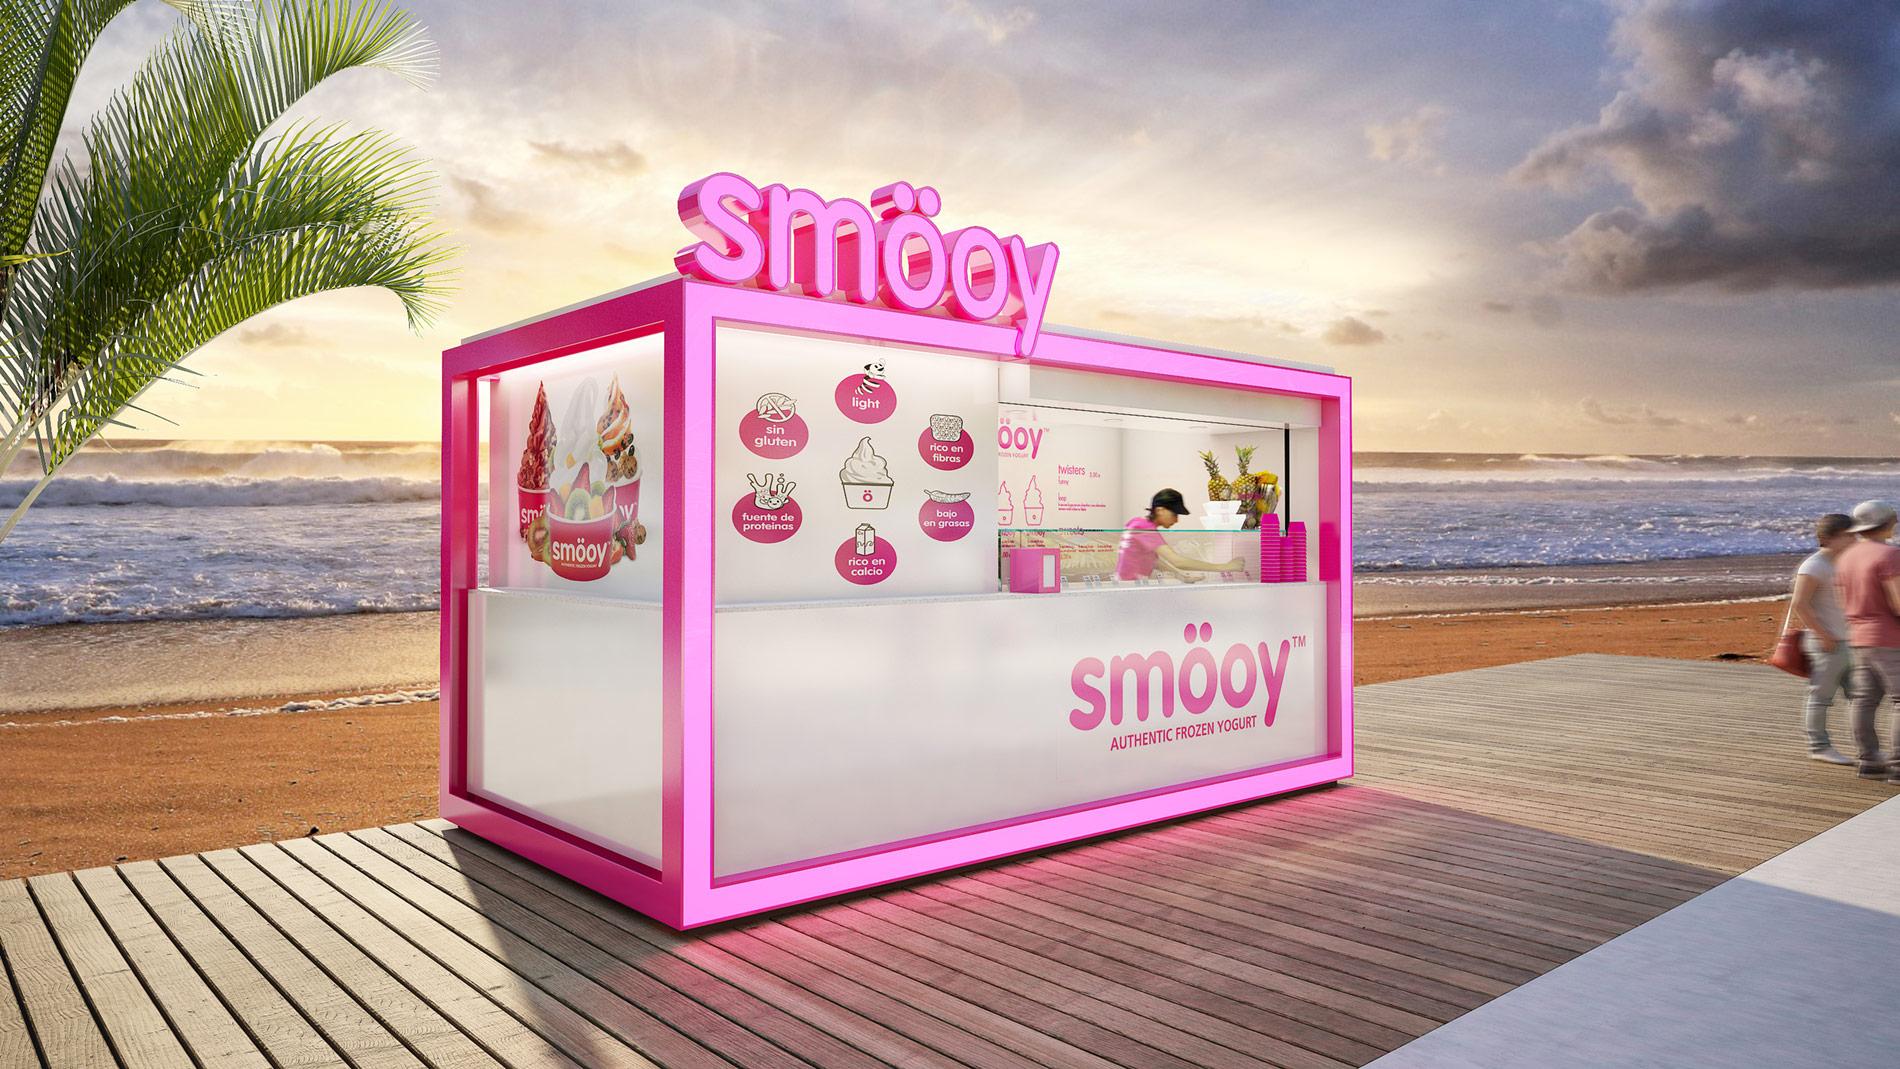 Heladería Smöoy